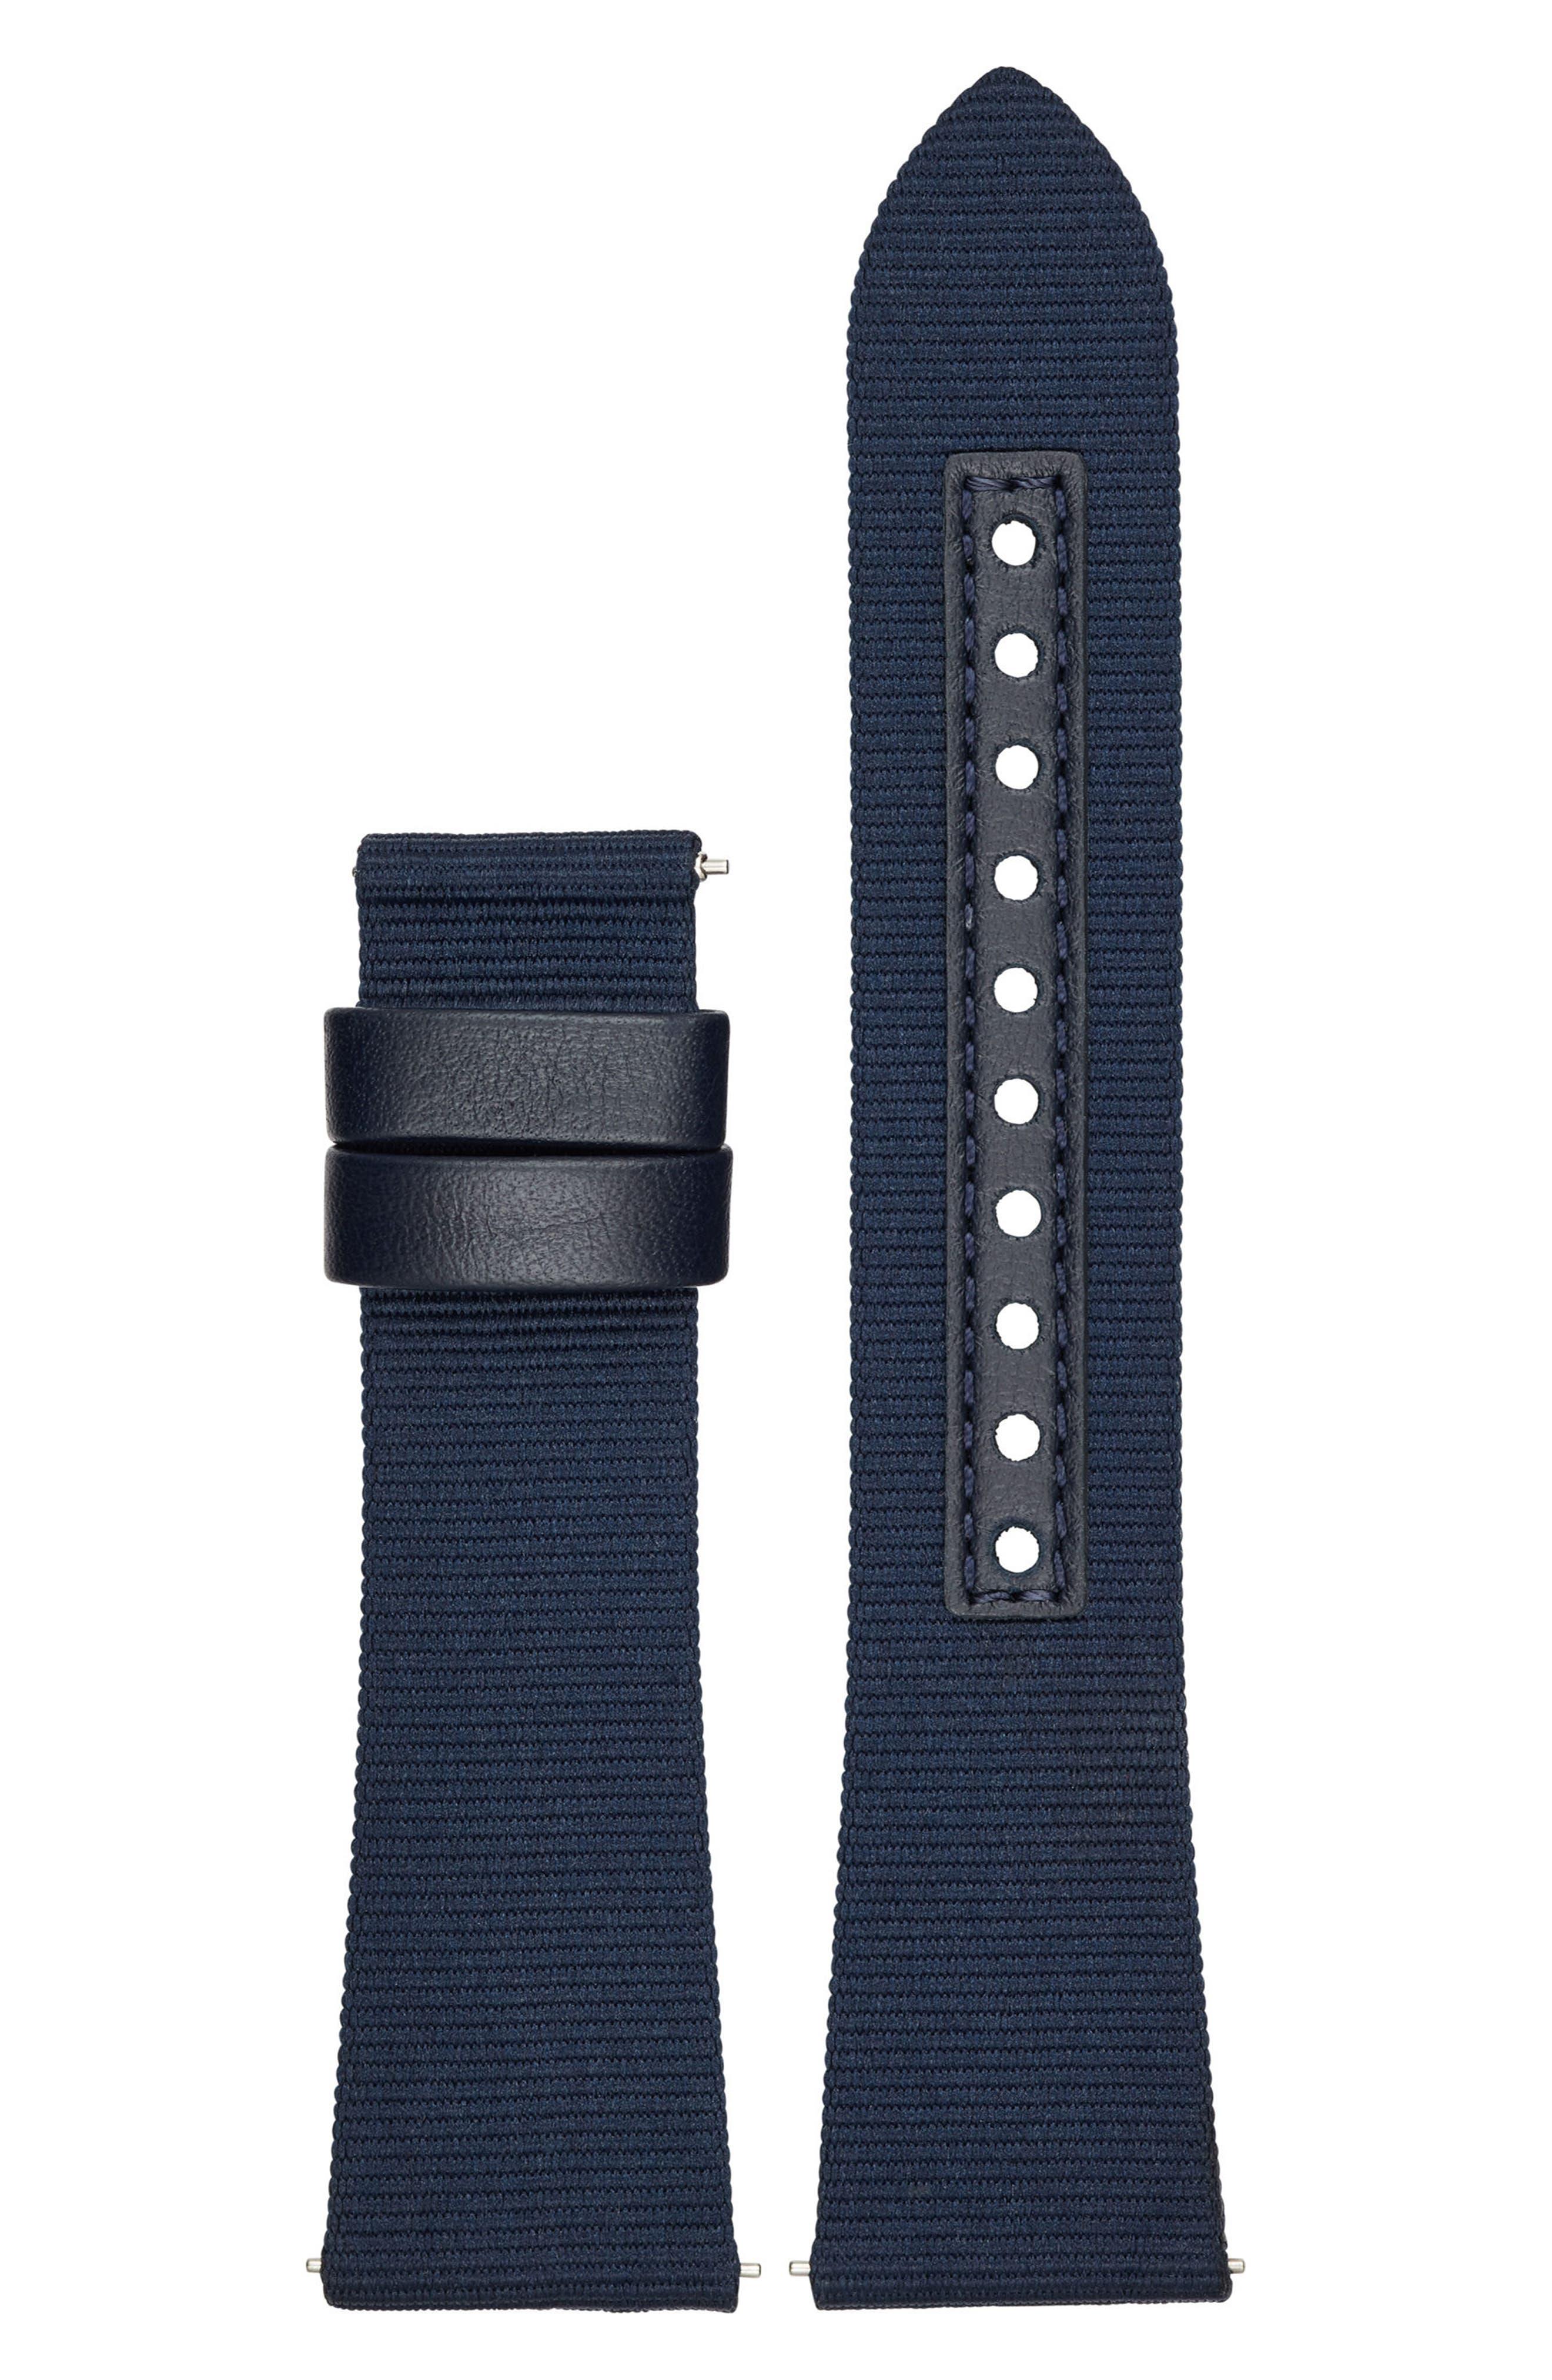 Main Image - Emporio Armani 22mm Canvas Watch Strap